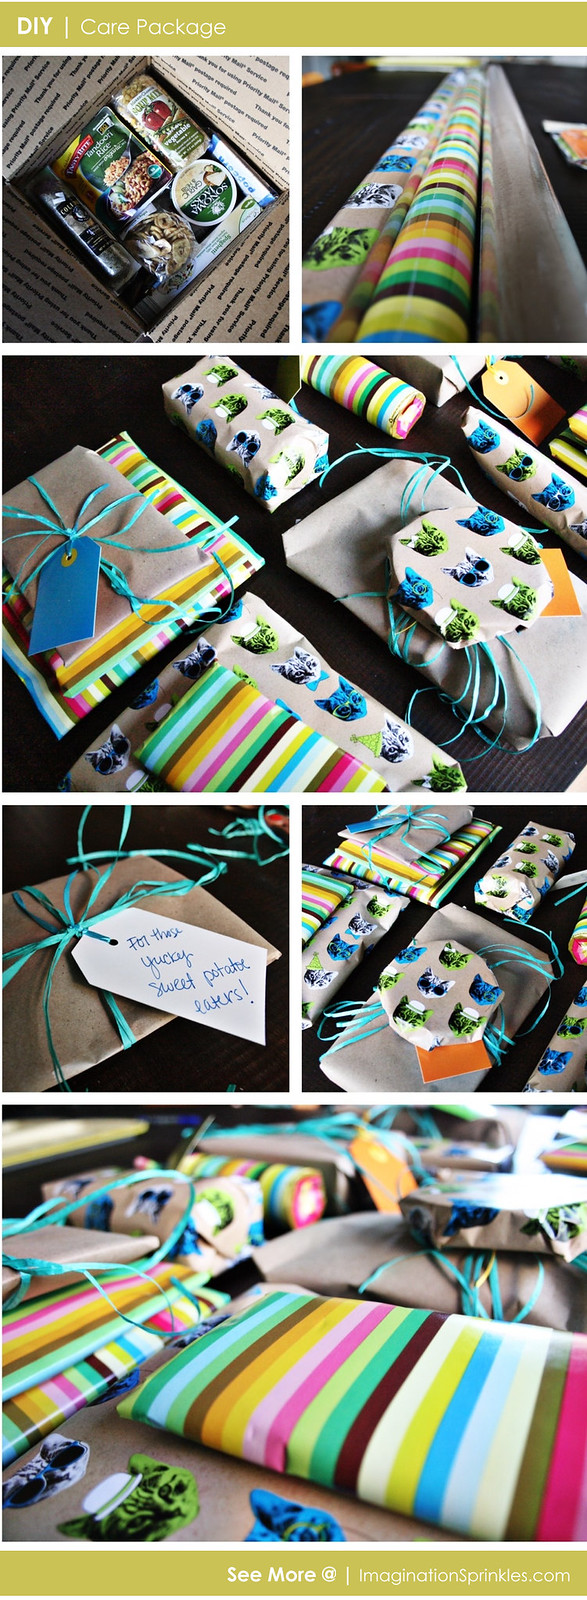 DIY - Care Package - Imagination Sprinkles